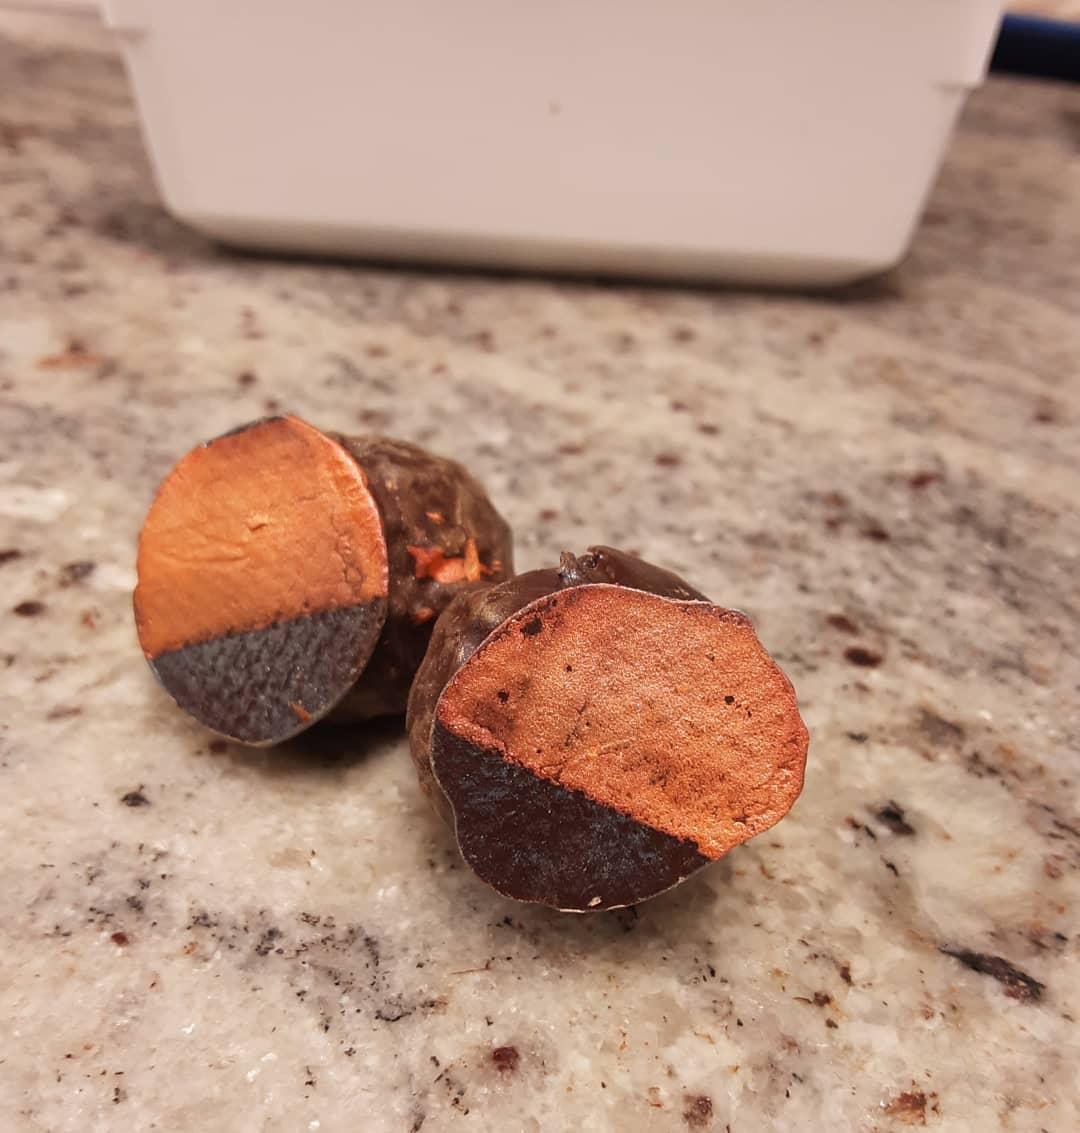 VIEW FROM INSIDE THE WHALE - Etrog Citron caramelized ganache truffle. #chocolatier #chocolatetruffles #truffesauchocolat #etrog Conveniently perfect timing. Pass the matzo? (Where *did* that matzo go?)